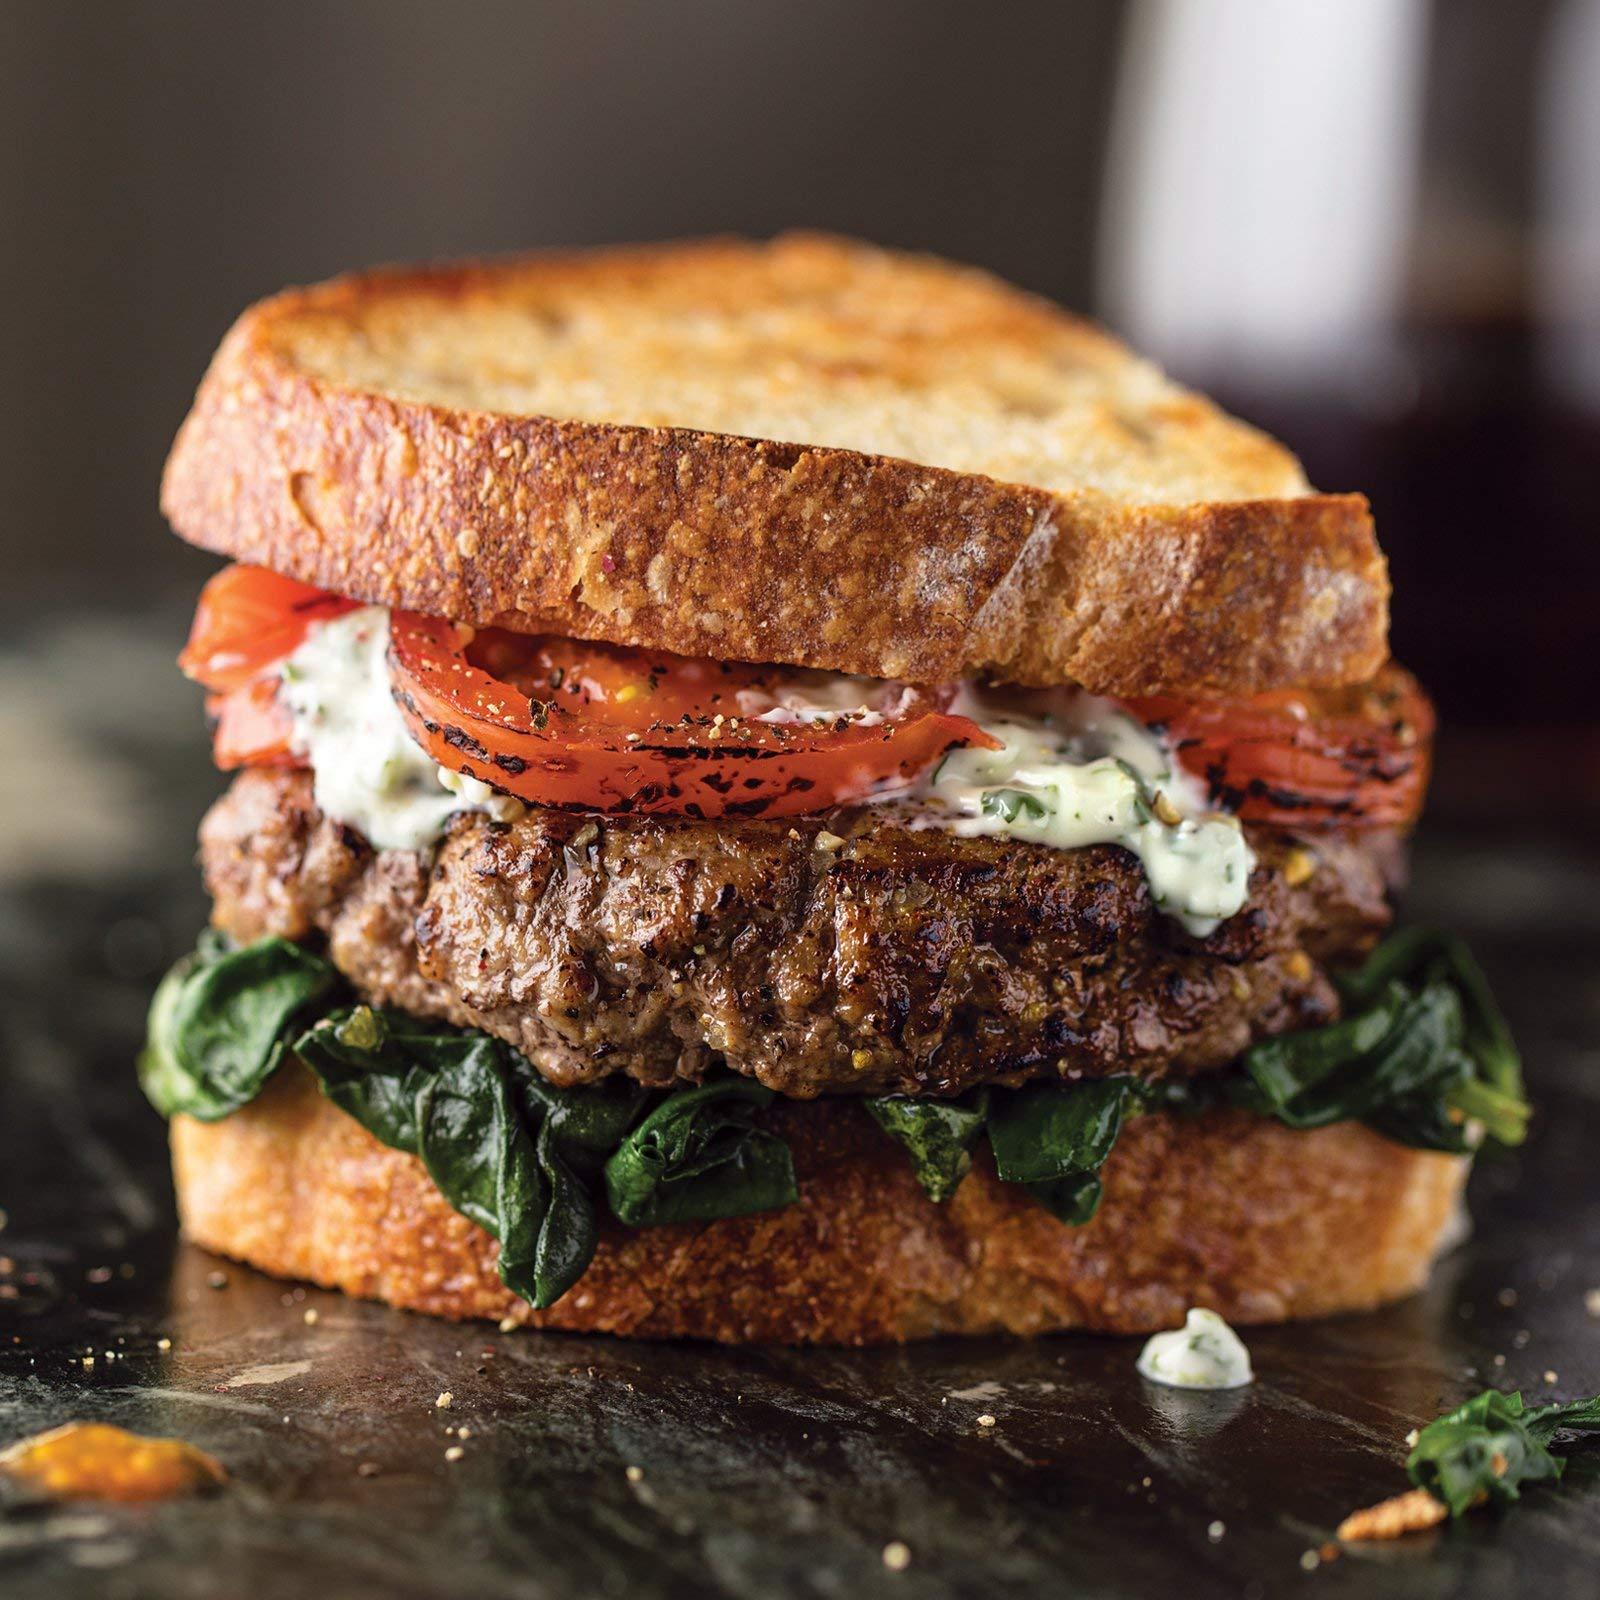 Omaha Steaks 4 (5.3 oz.) Delmonico Burgers